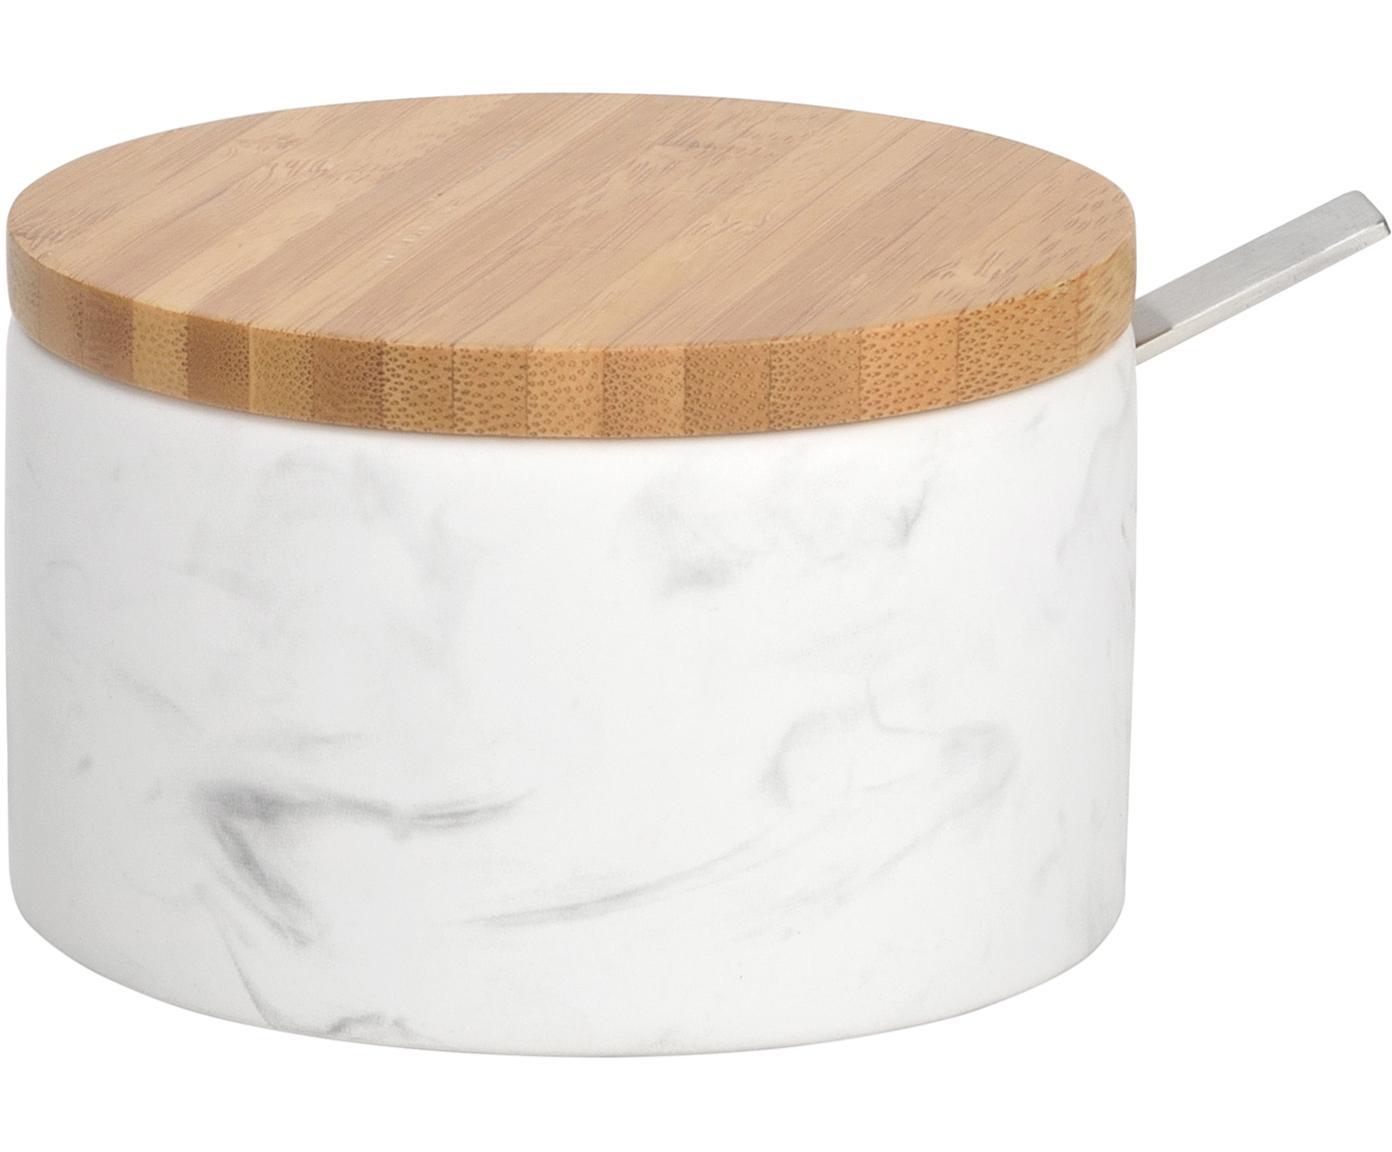 Suikerpot Kalina met lepel, Keramiek, bamboe, Gemarmerd wit, bamboekleurig, Ø 13 x H 7 cm